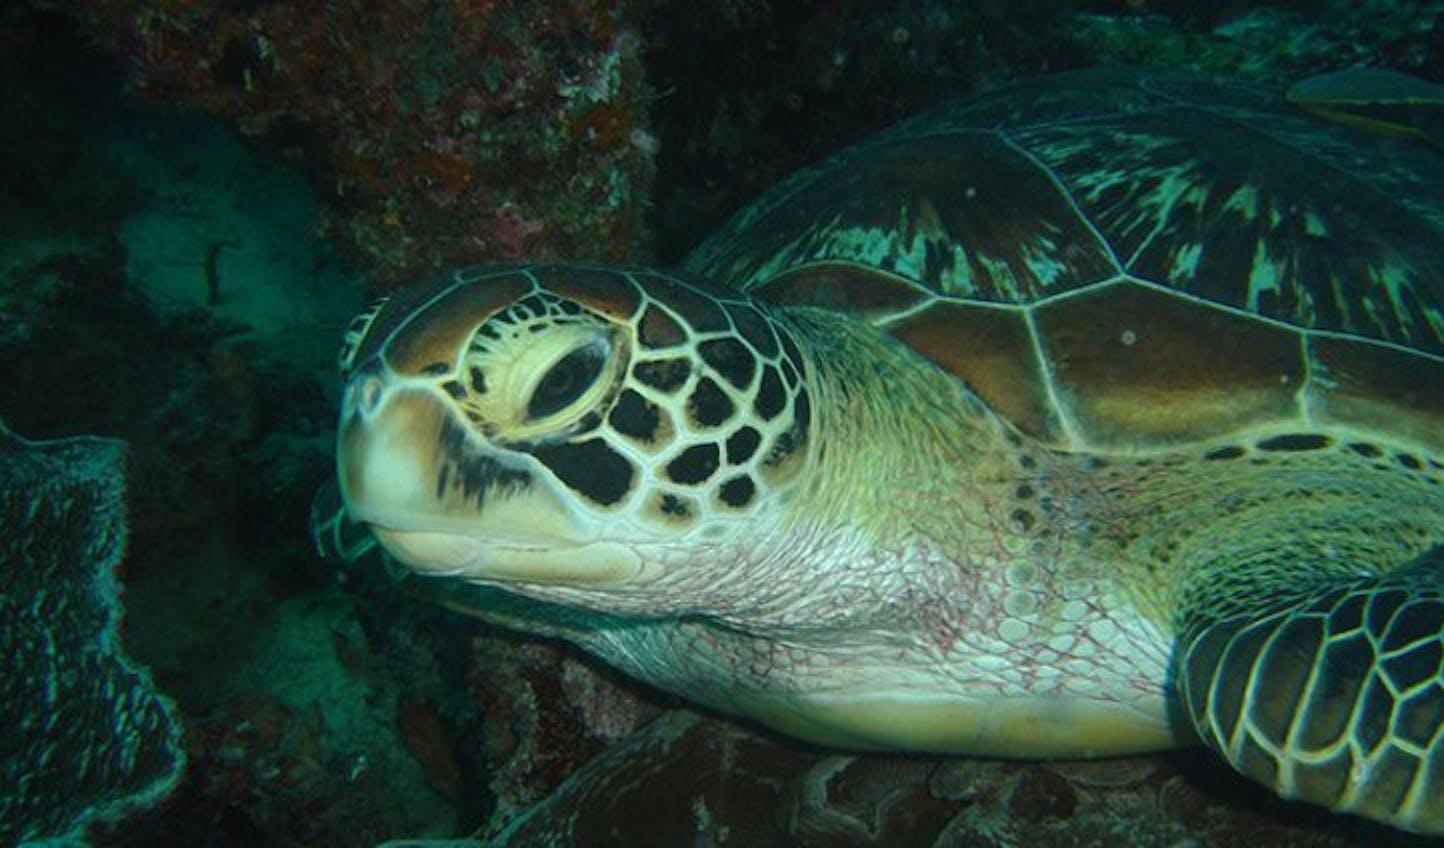 turtles at benguerra